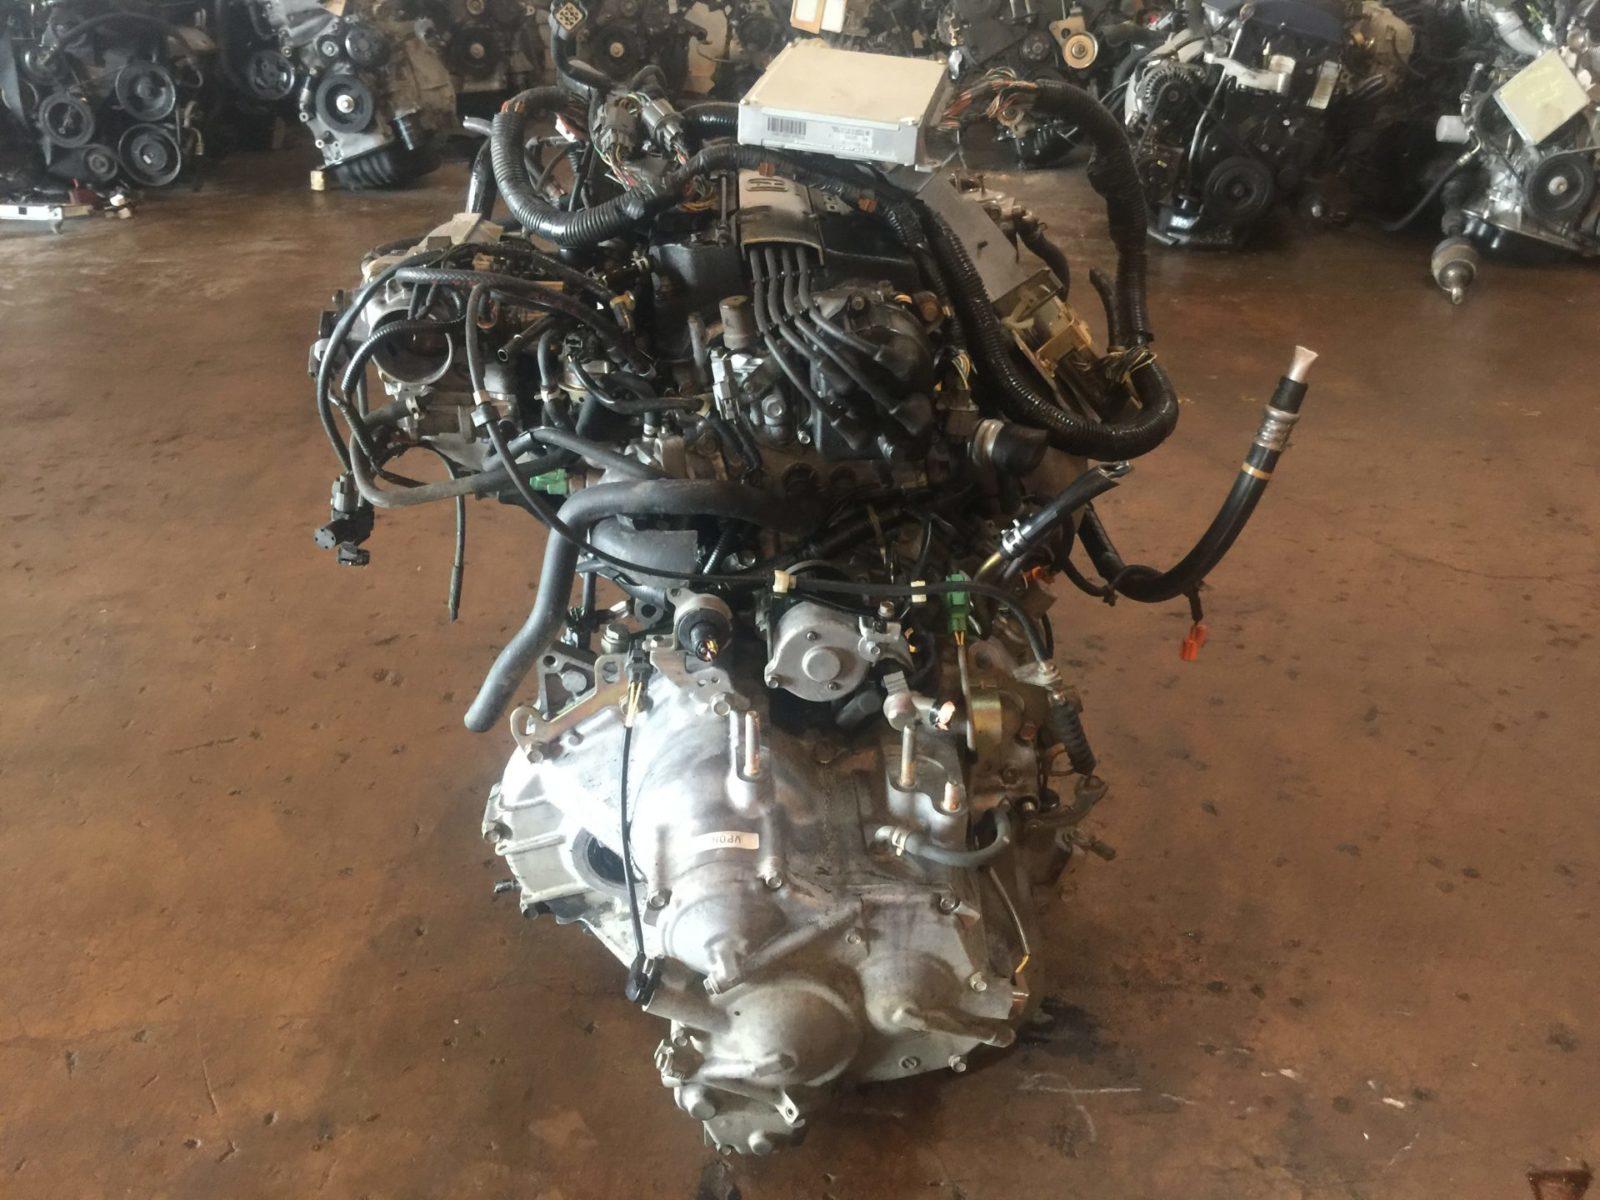 Jdm H22a Obd 1 Dohc Vtec Engine Automatic Transmission Wire Ecu 92 Wiring Harness Img 4097